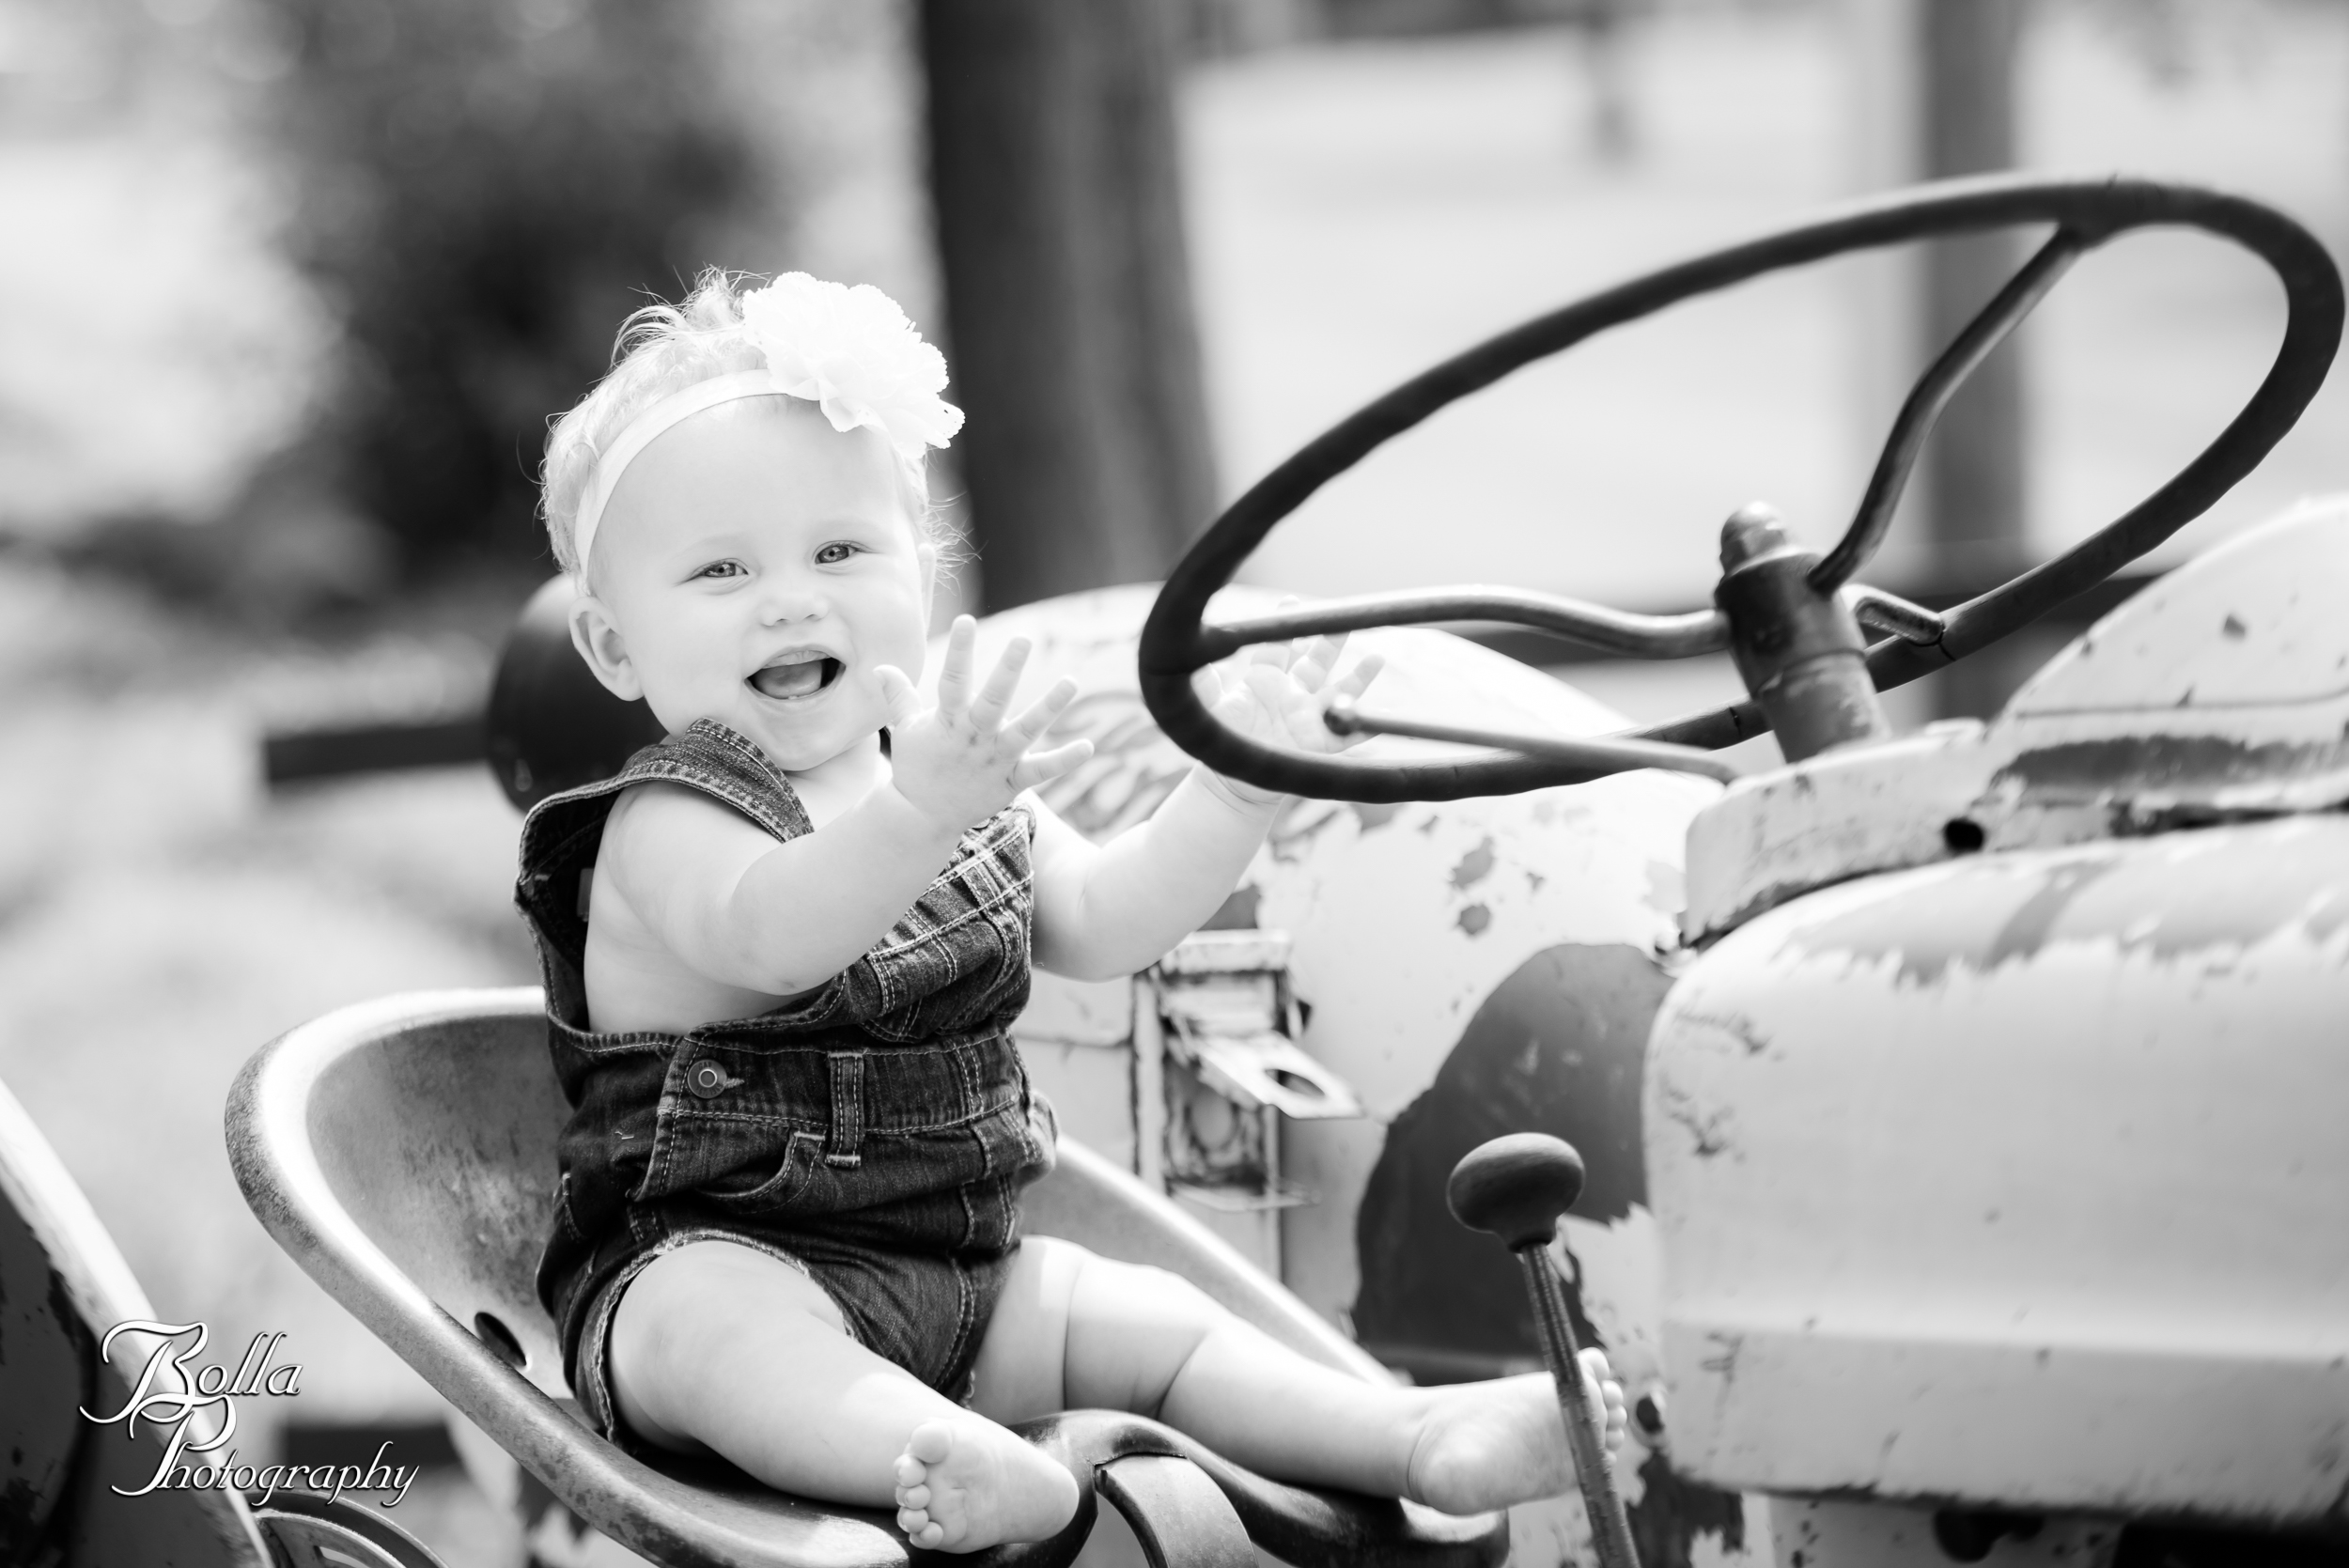 20170805_Bolla photography edwardsville wedding newborn baby photographer st louis weddings babies-2-4.jpg